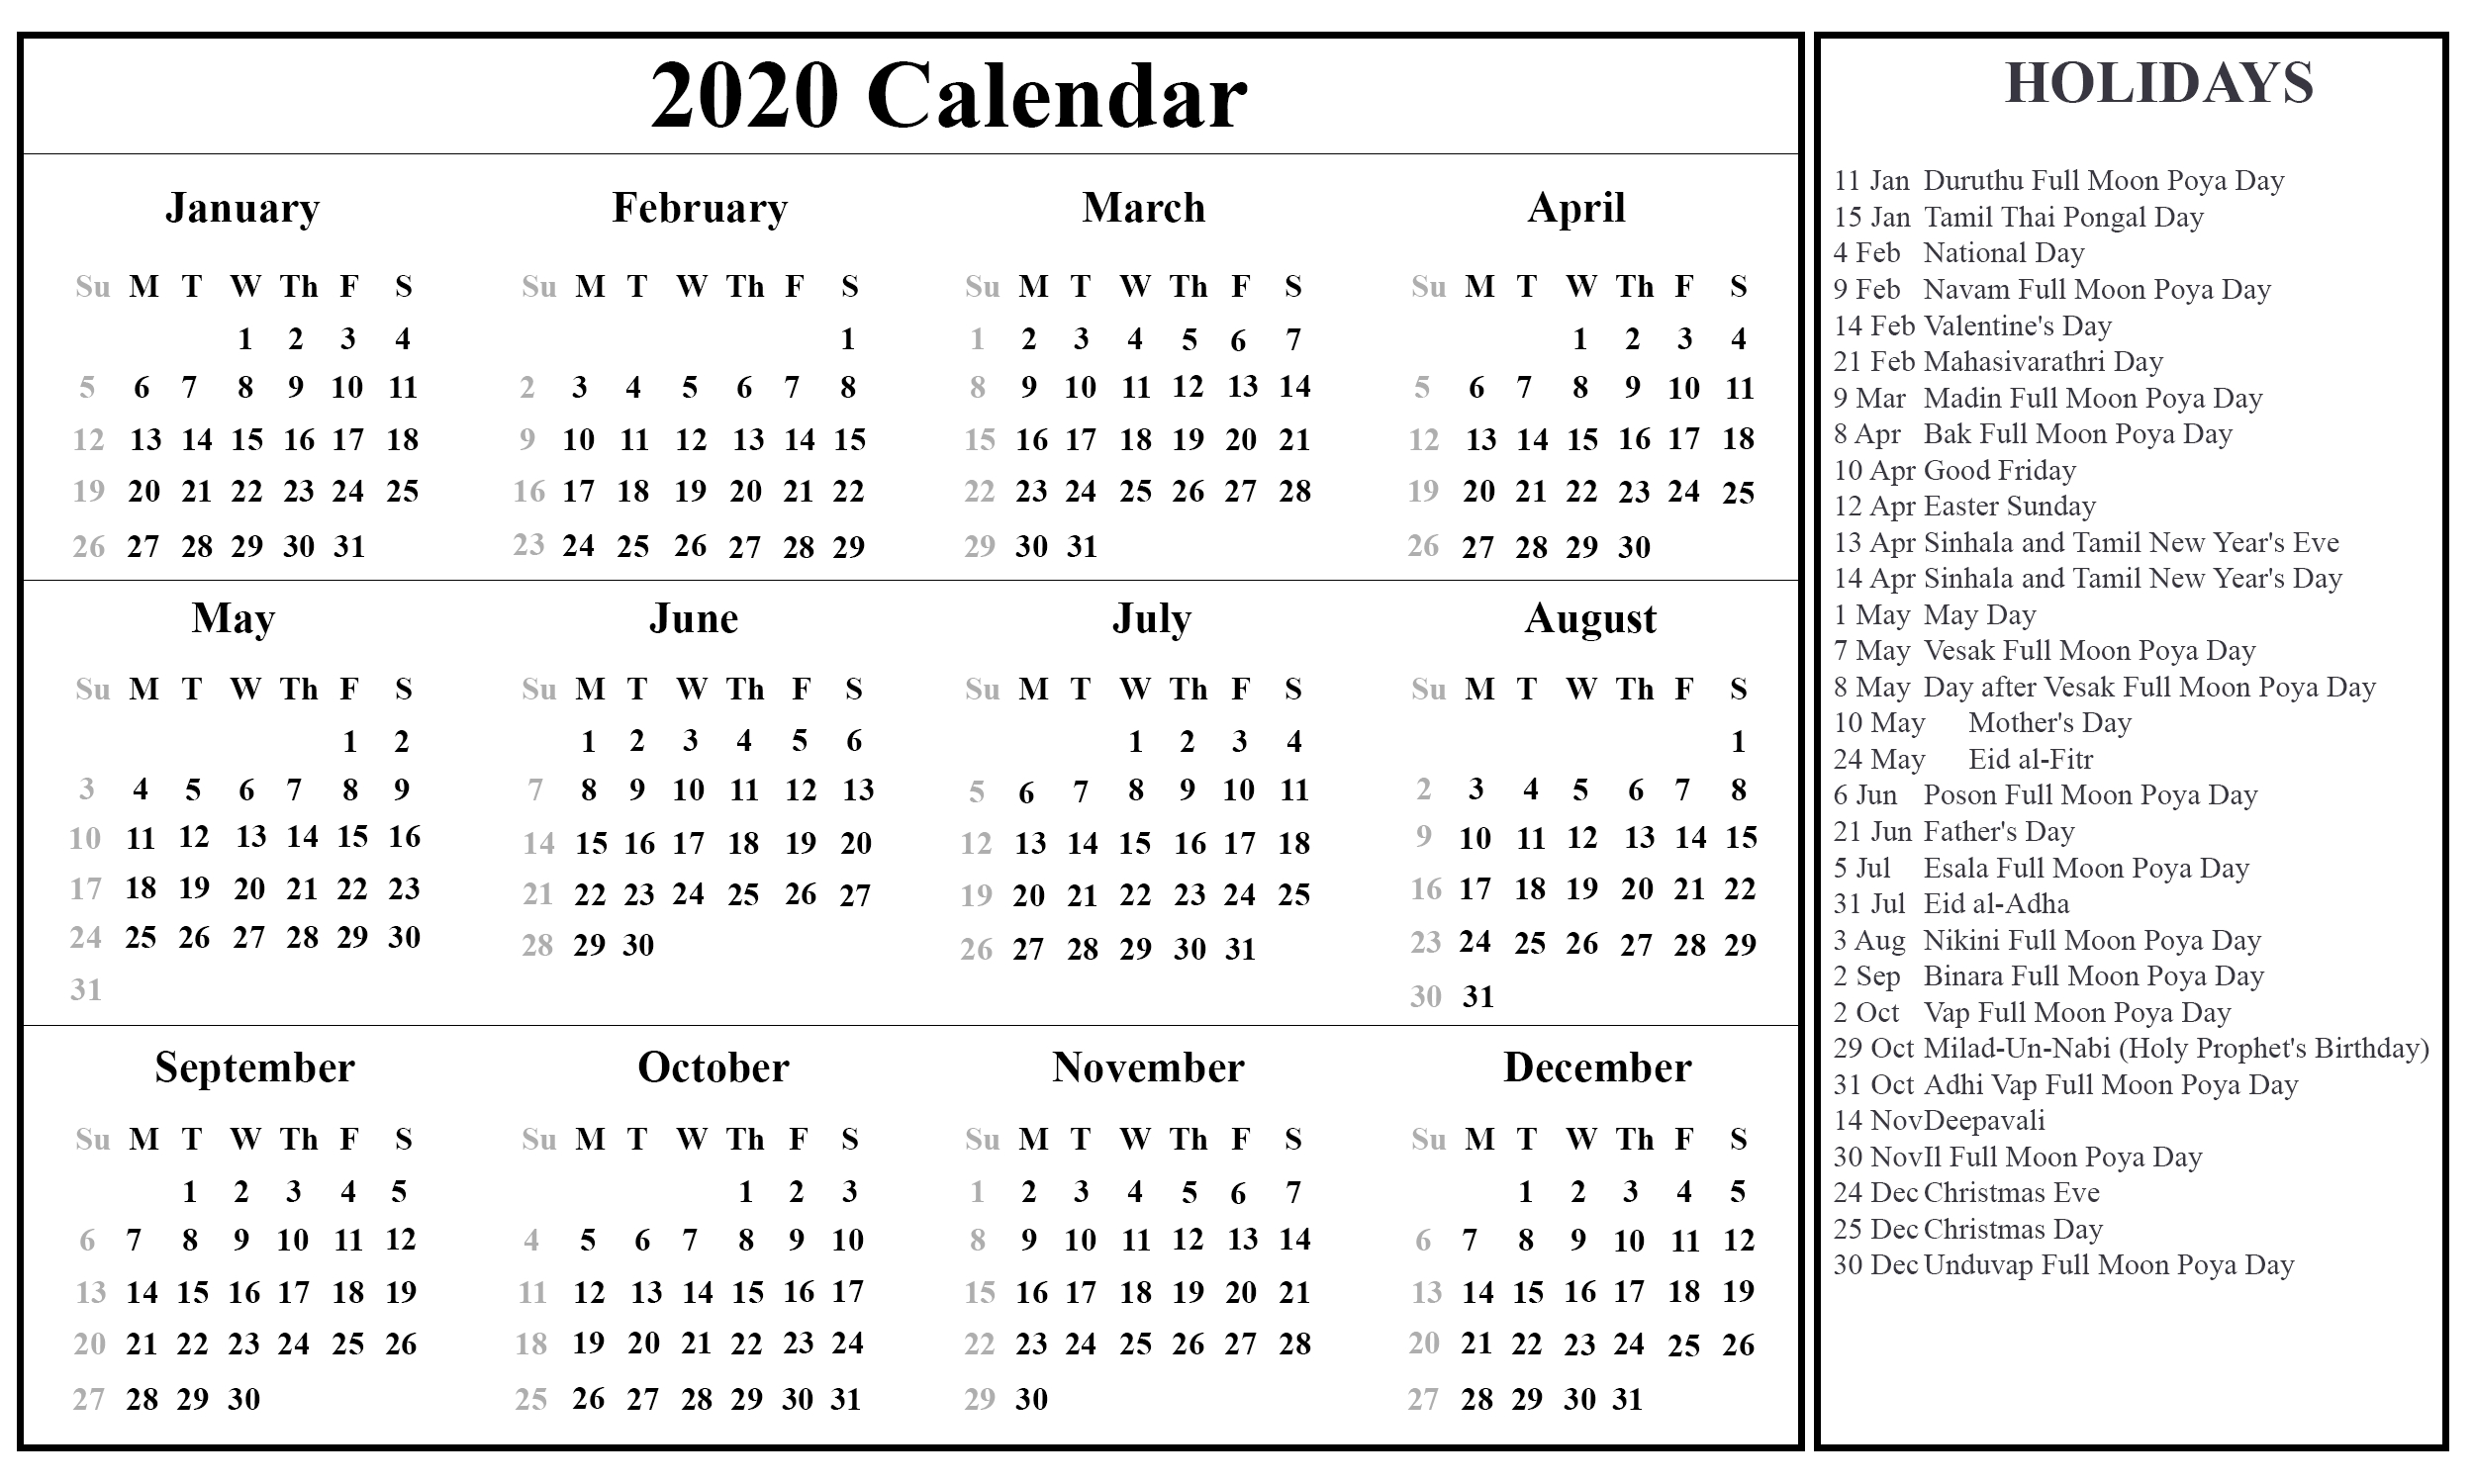 Free Printable Sri Lanka Calendar 2020 With Holidays In Pdf-2020 January Calendar Sri Lanka